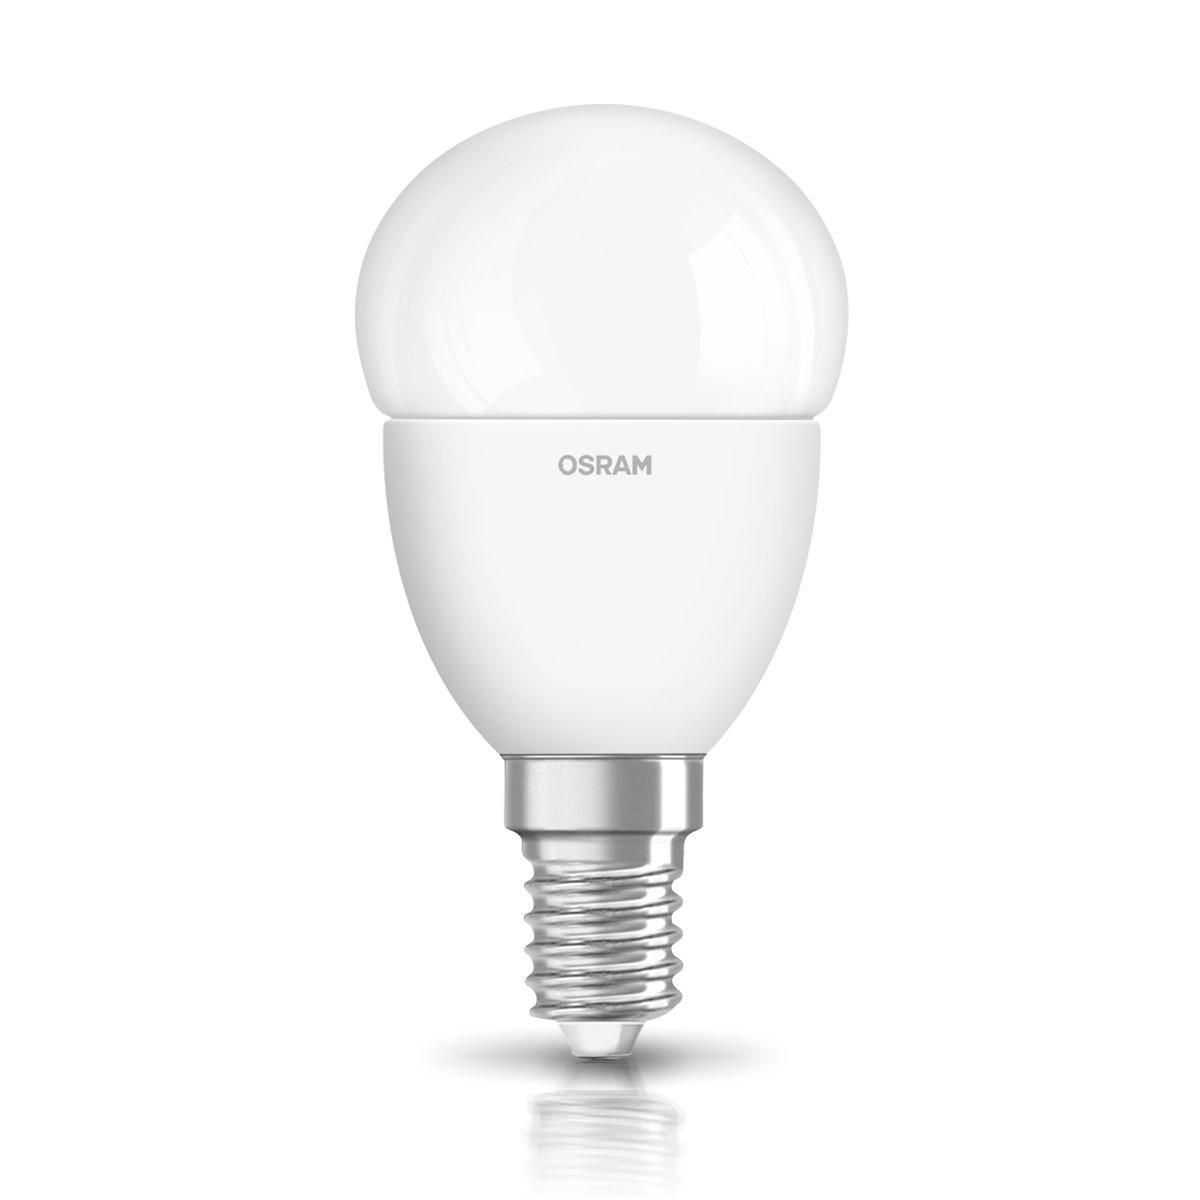 Лампа светодиодная OSRAM S CL P25 4W/840 220-240V FR  E14 шар матовый